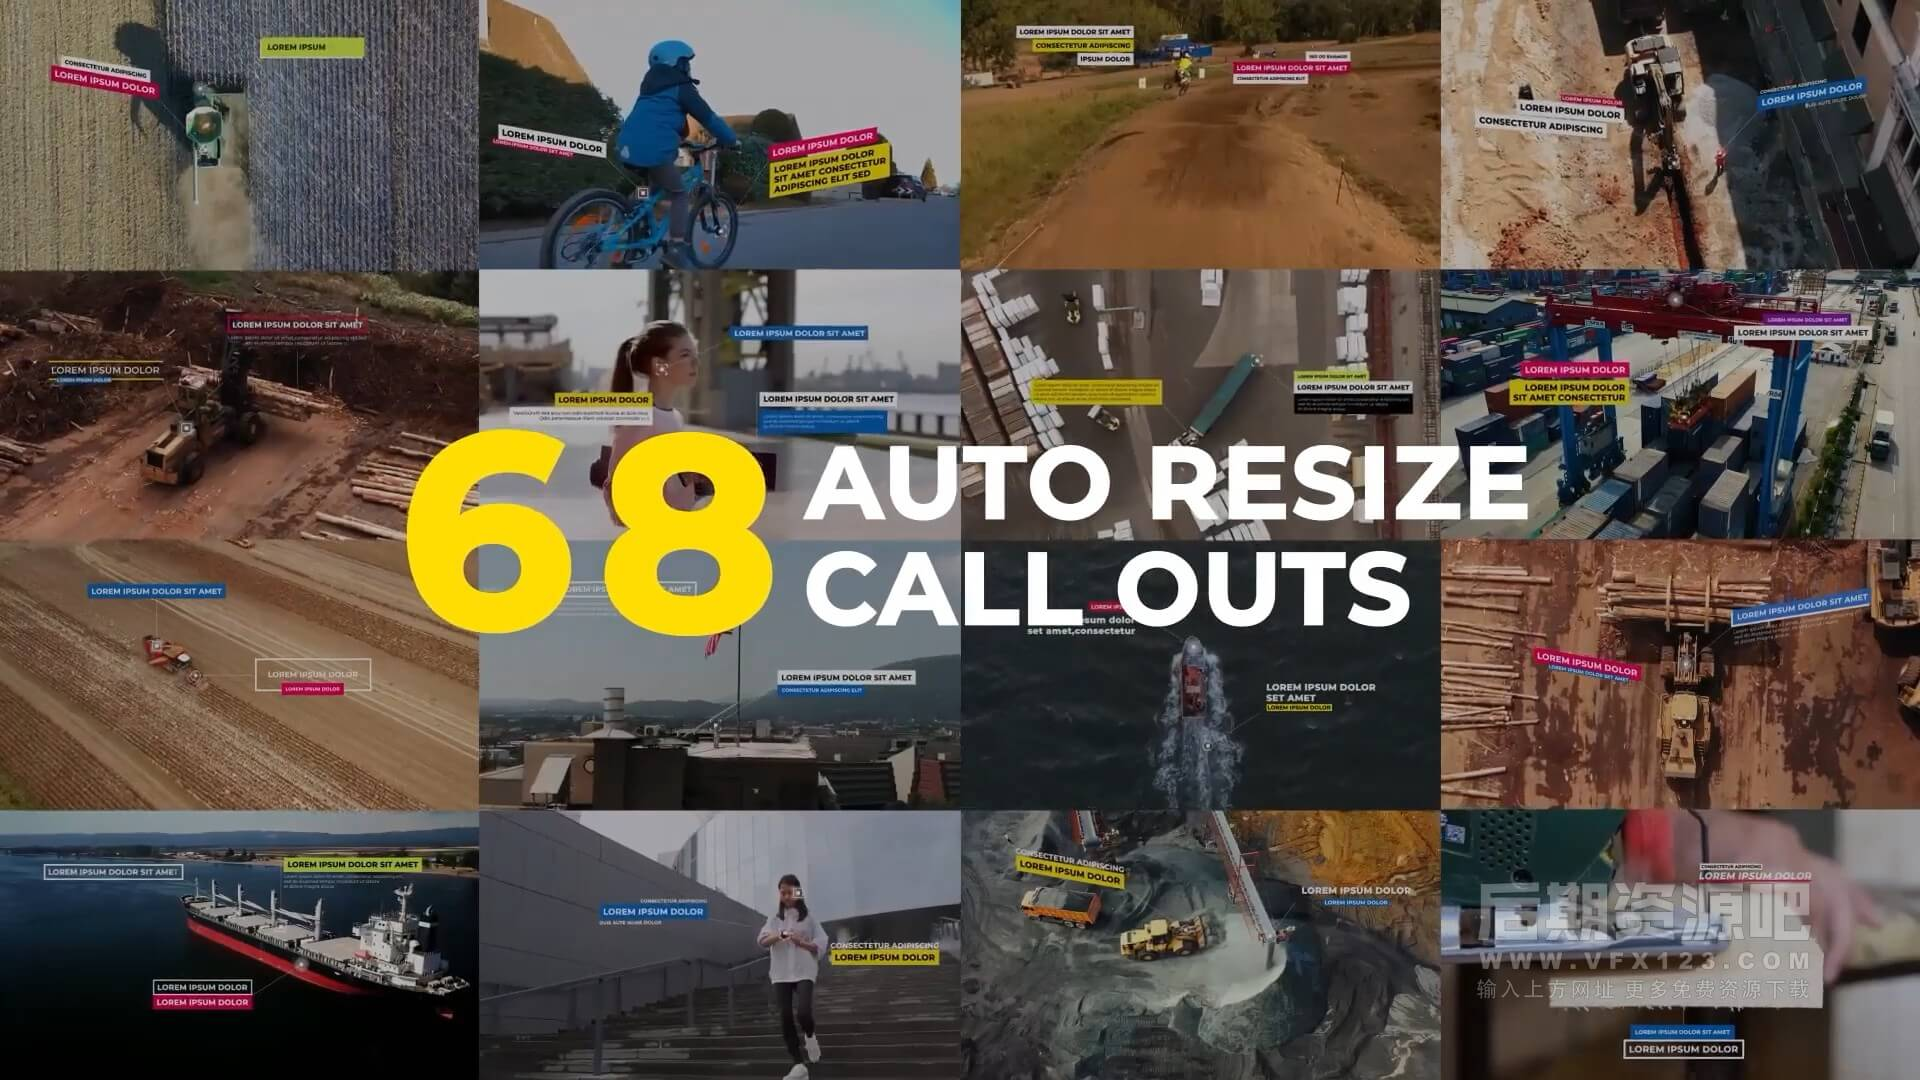 AE模板 线条呼出动画自动调整大小标注 Auto Resizing Call-Outs